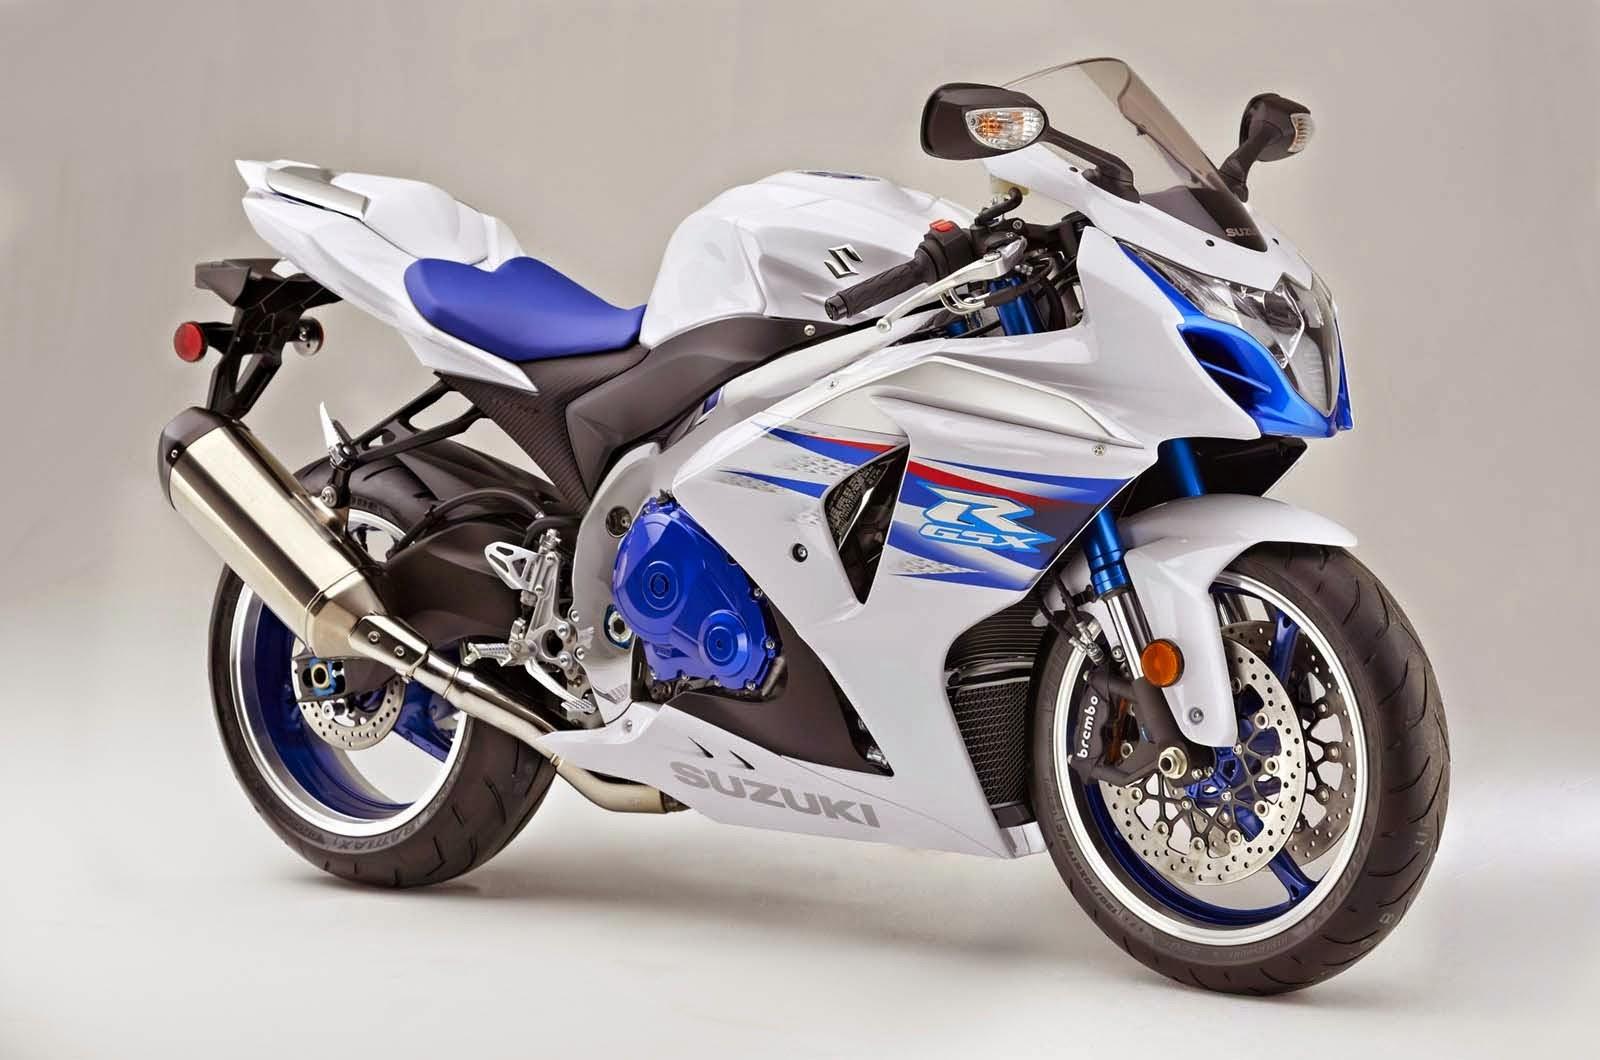 Harga Suzuki GSX 150 Penantang Baru Yamaha R15